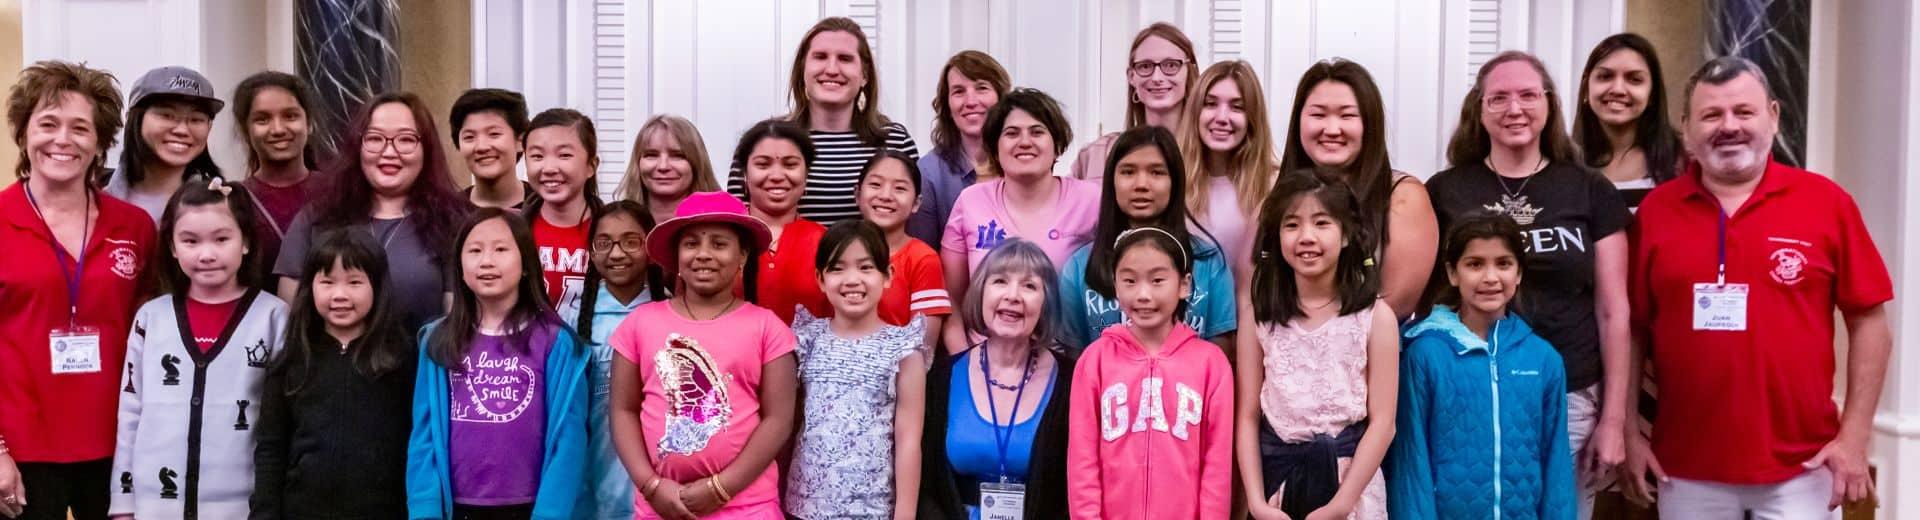 US Women's Open 2019 Group Photo